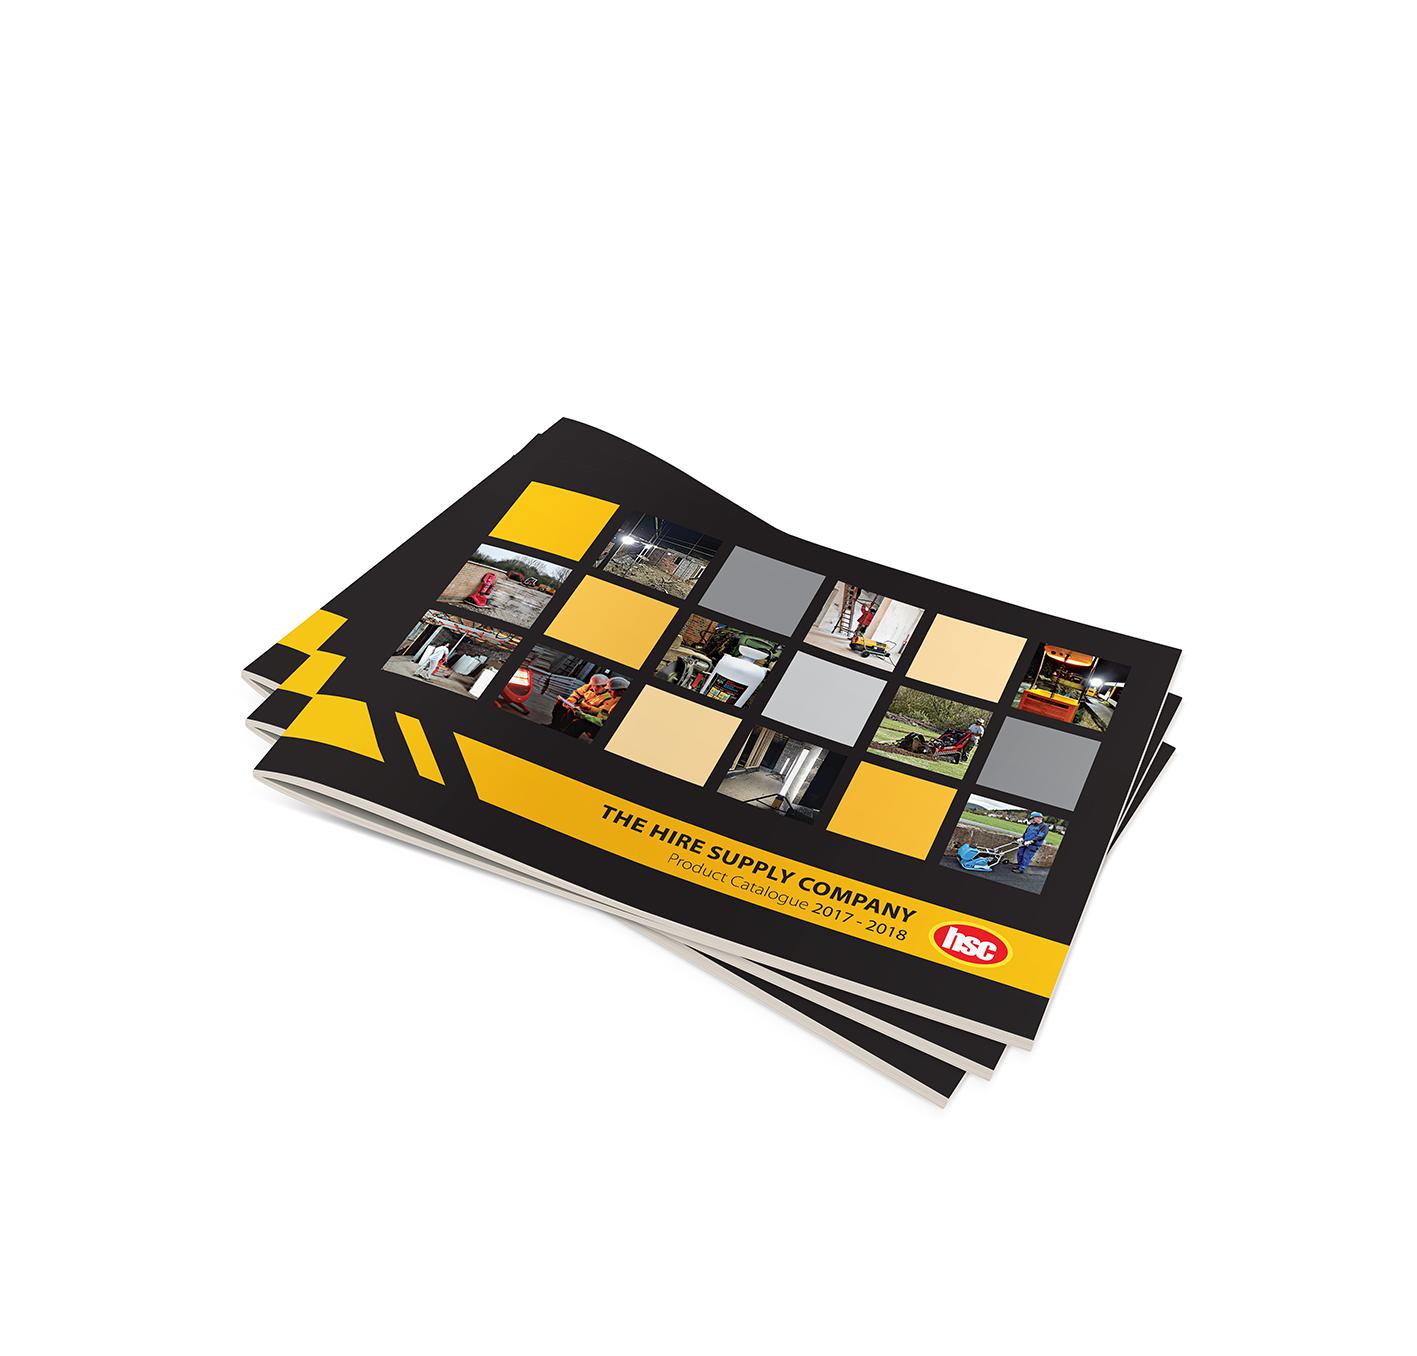 HSC Product Brochure [Print . Design]